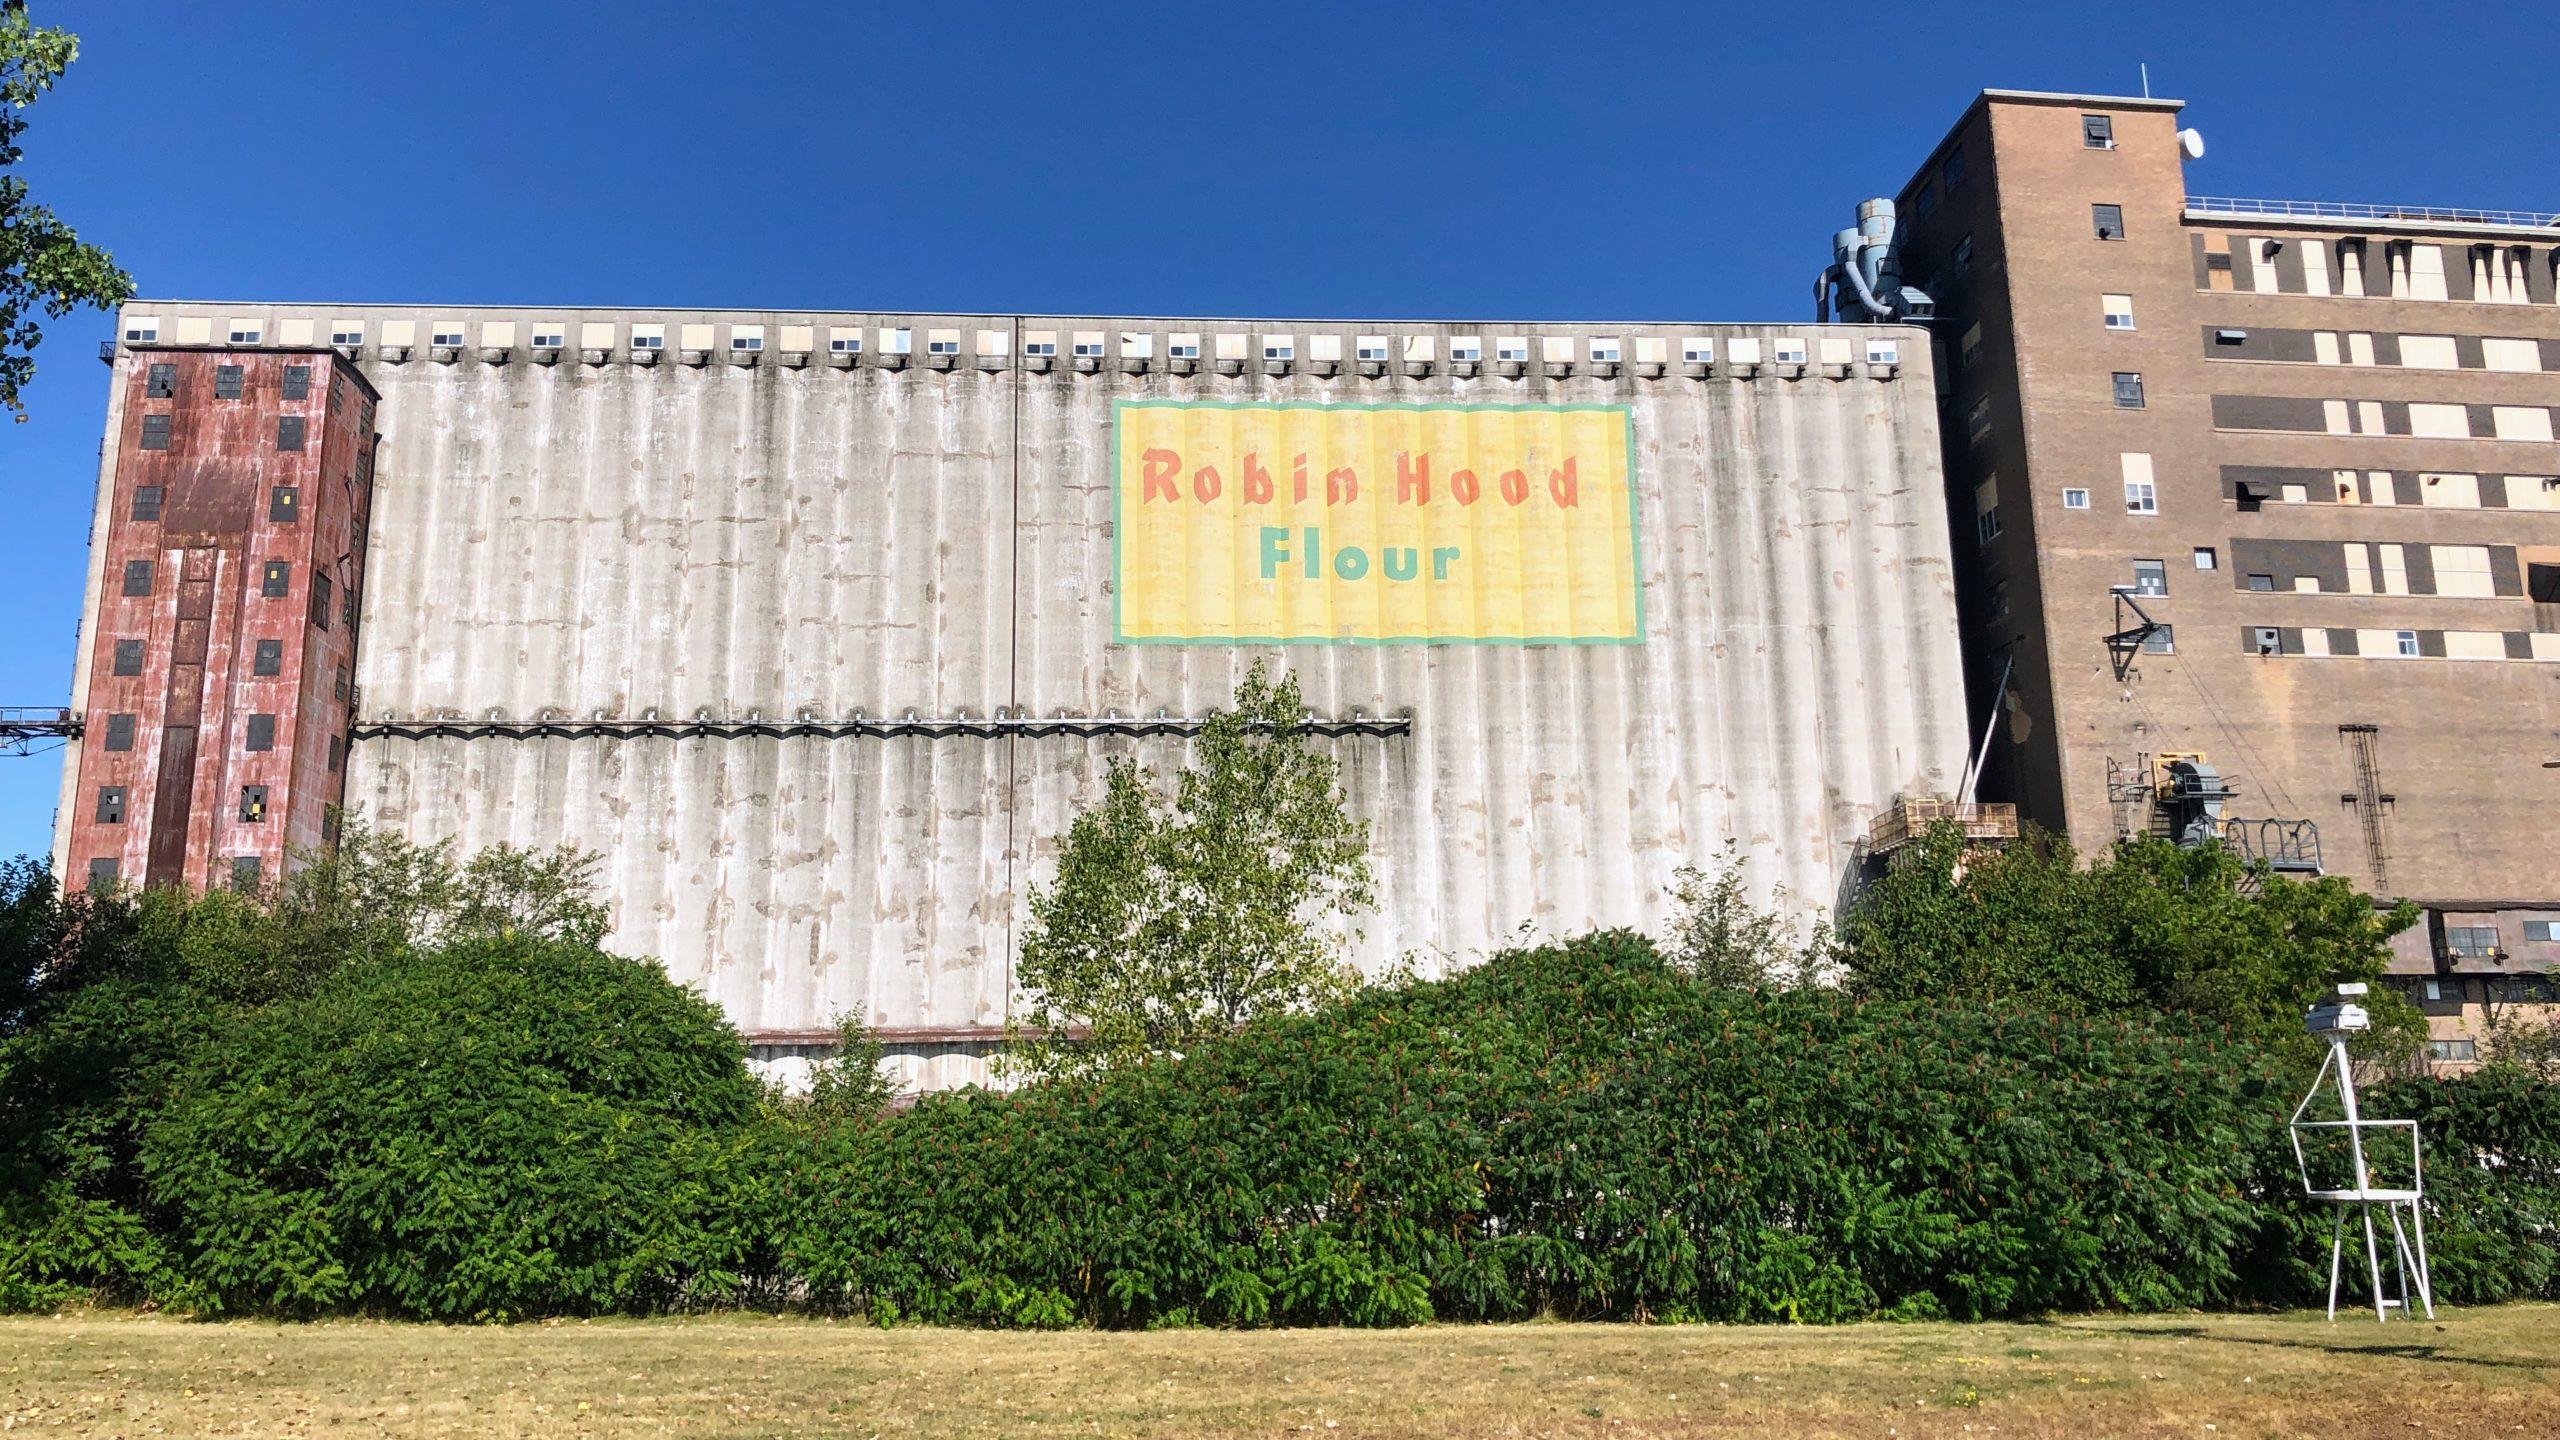 Robin Hood Flour in Port Colborne along the Welland Canal